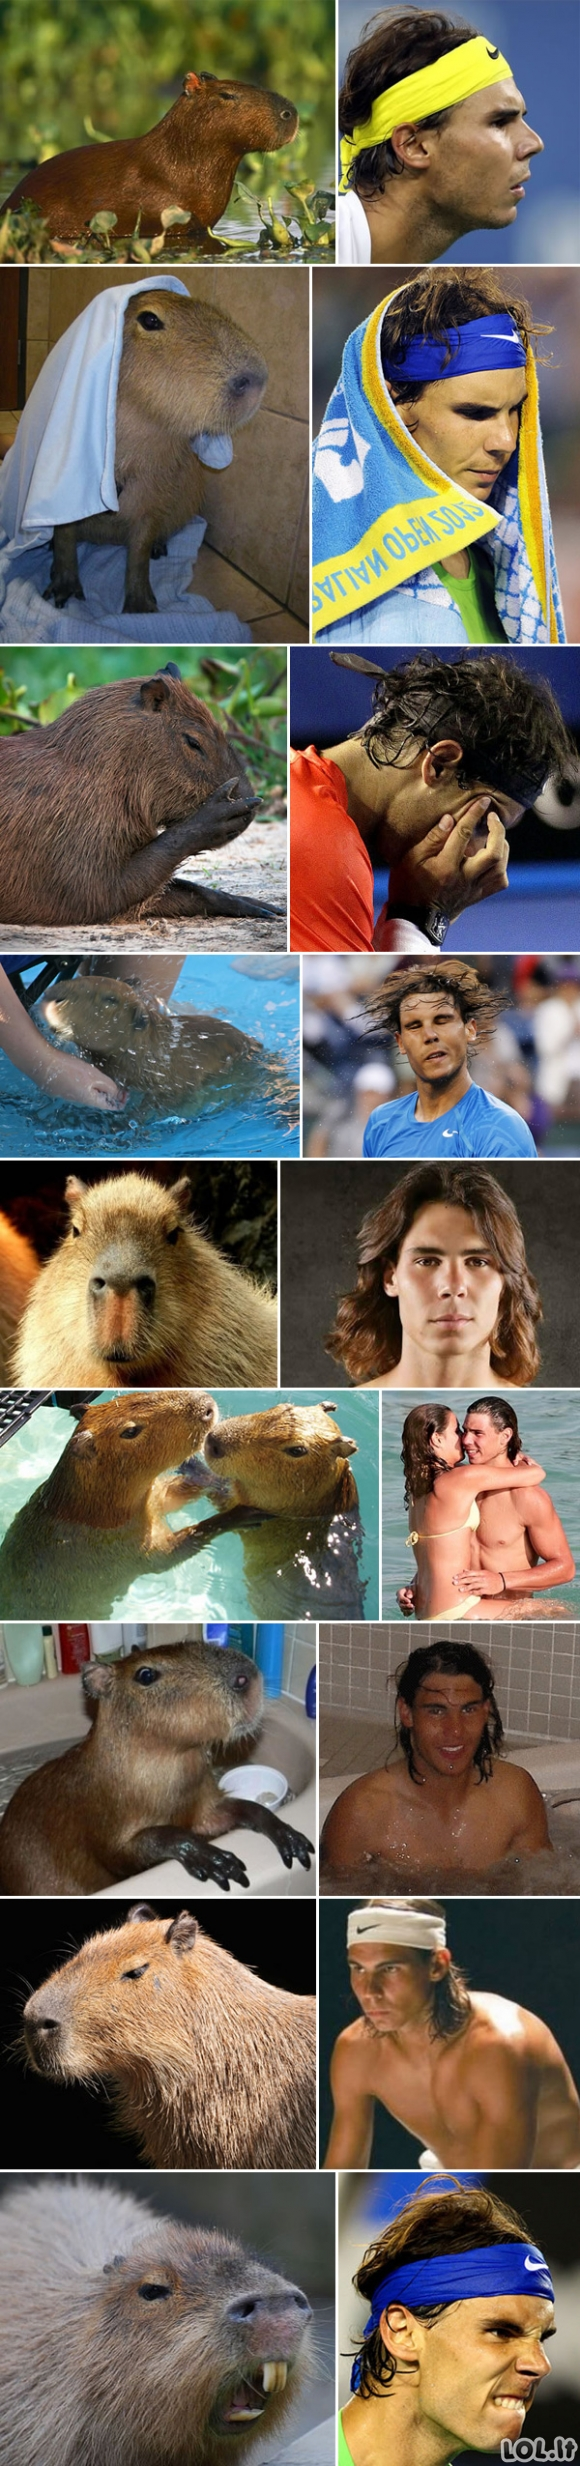 Kapibara prieš Nadalį